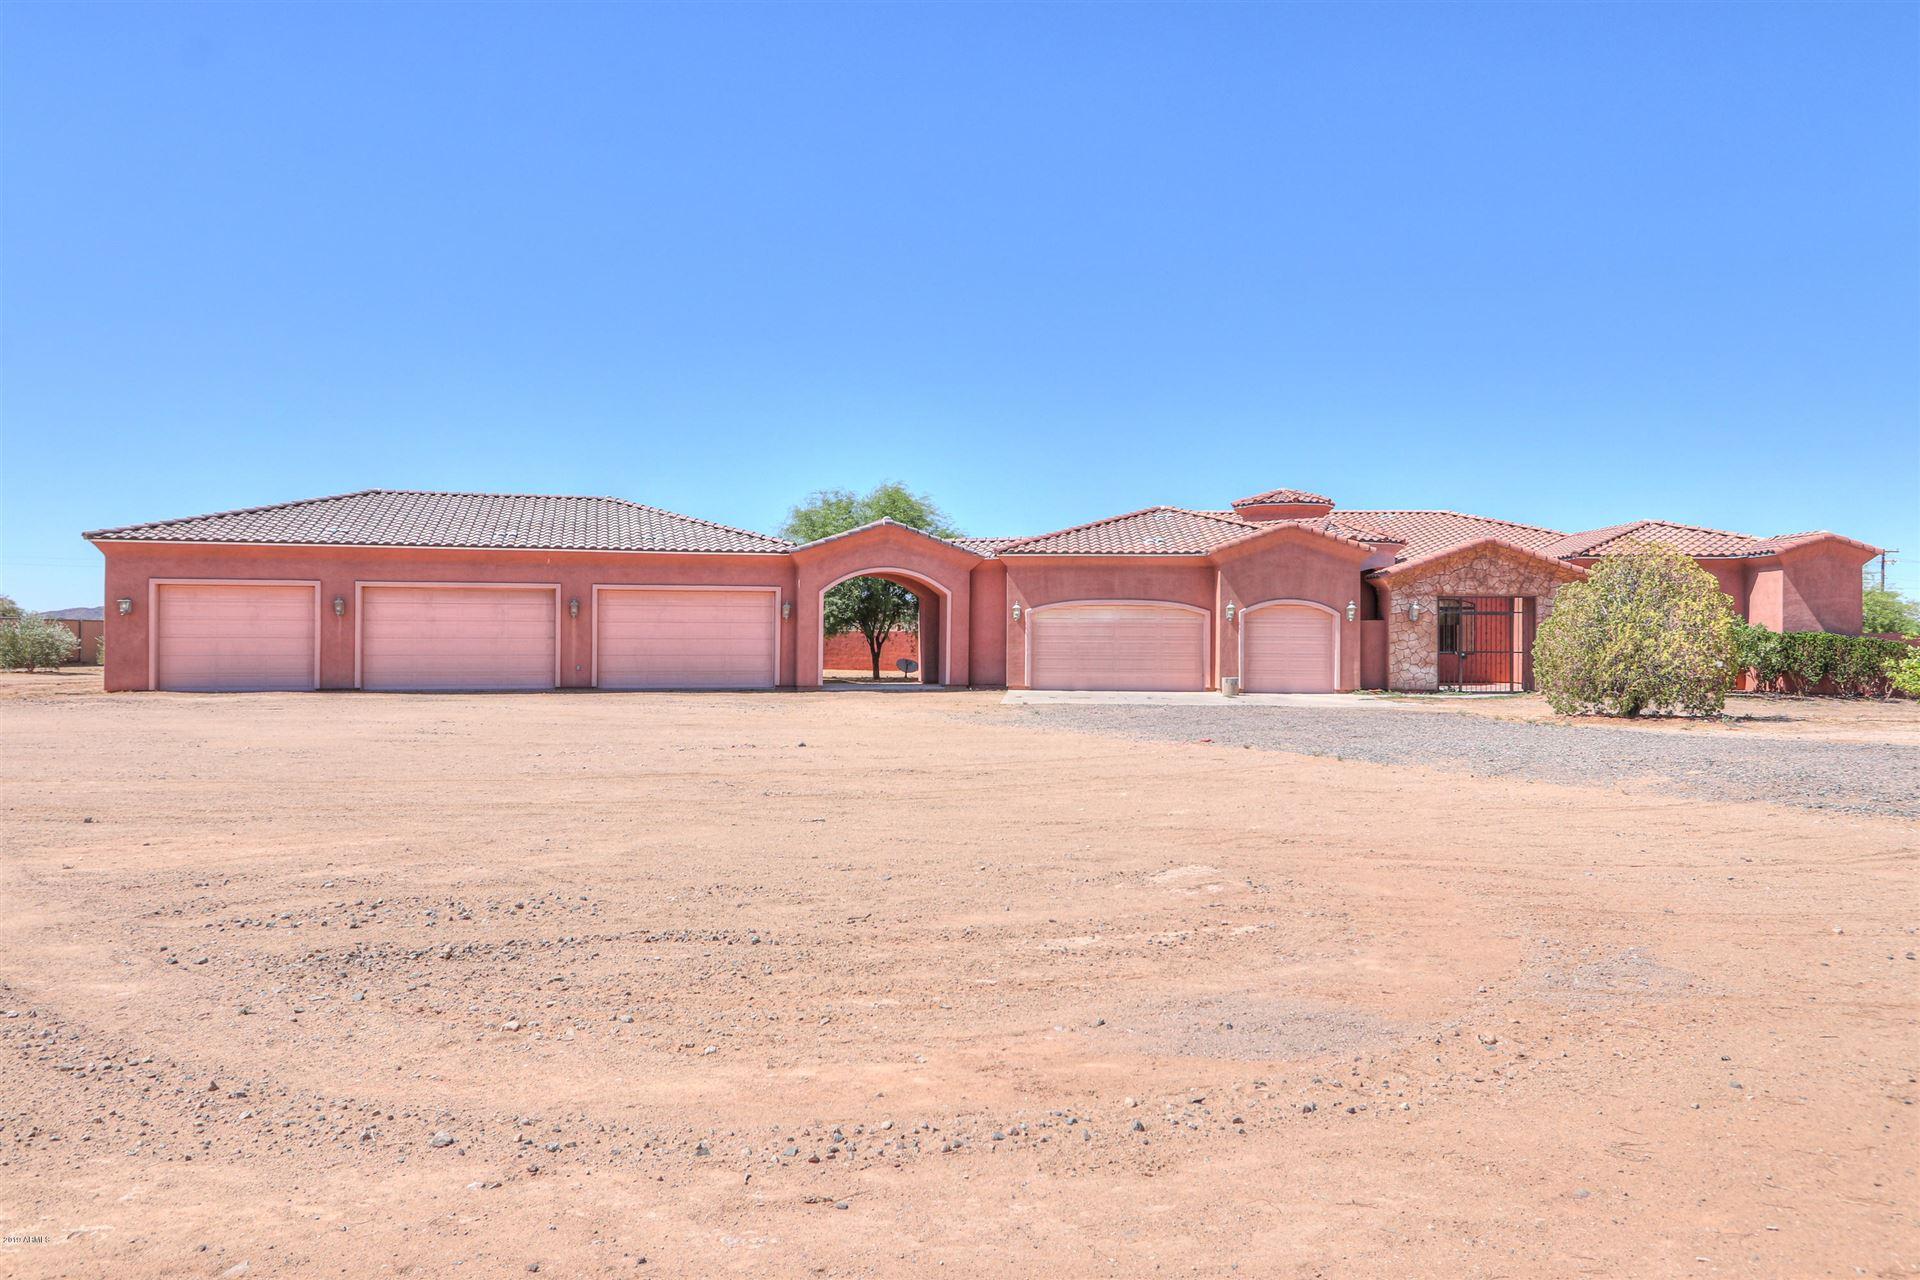 Photo for 52854 W BARREL Road, Maricopa, AZ 85139 (MLS # 6132920)